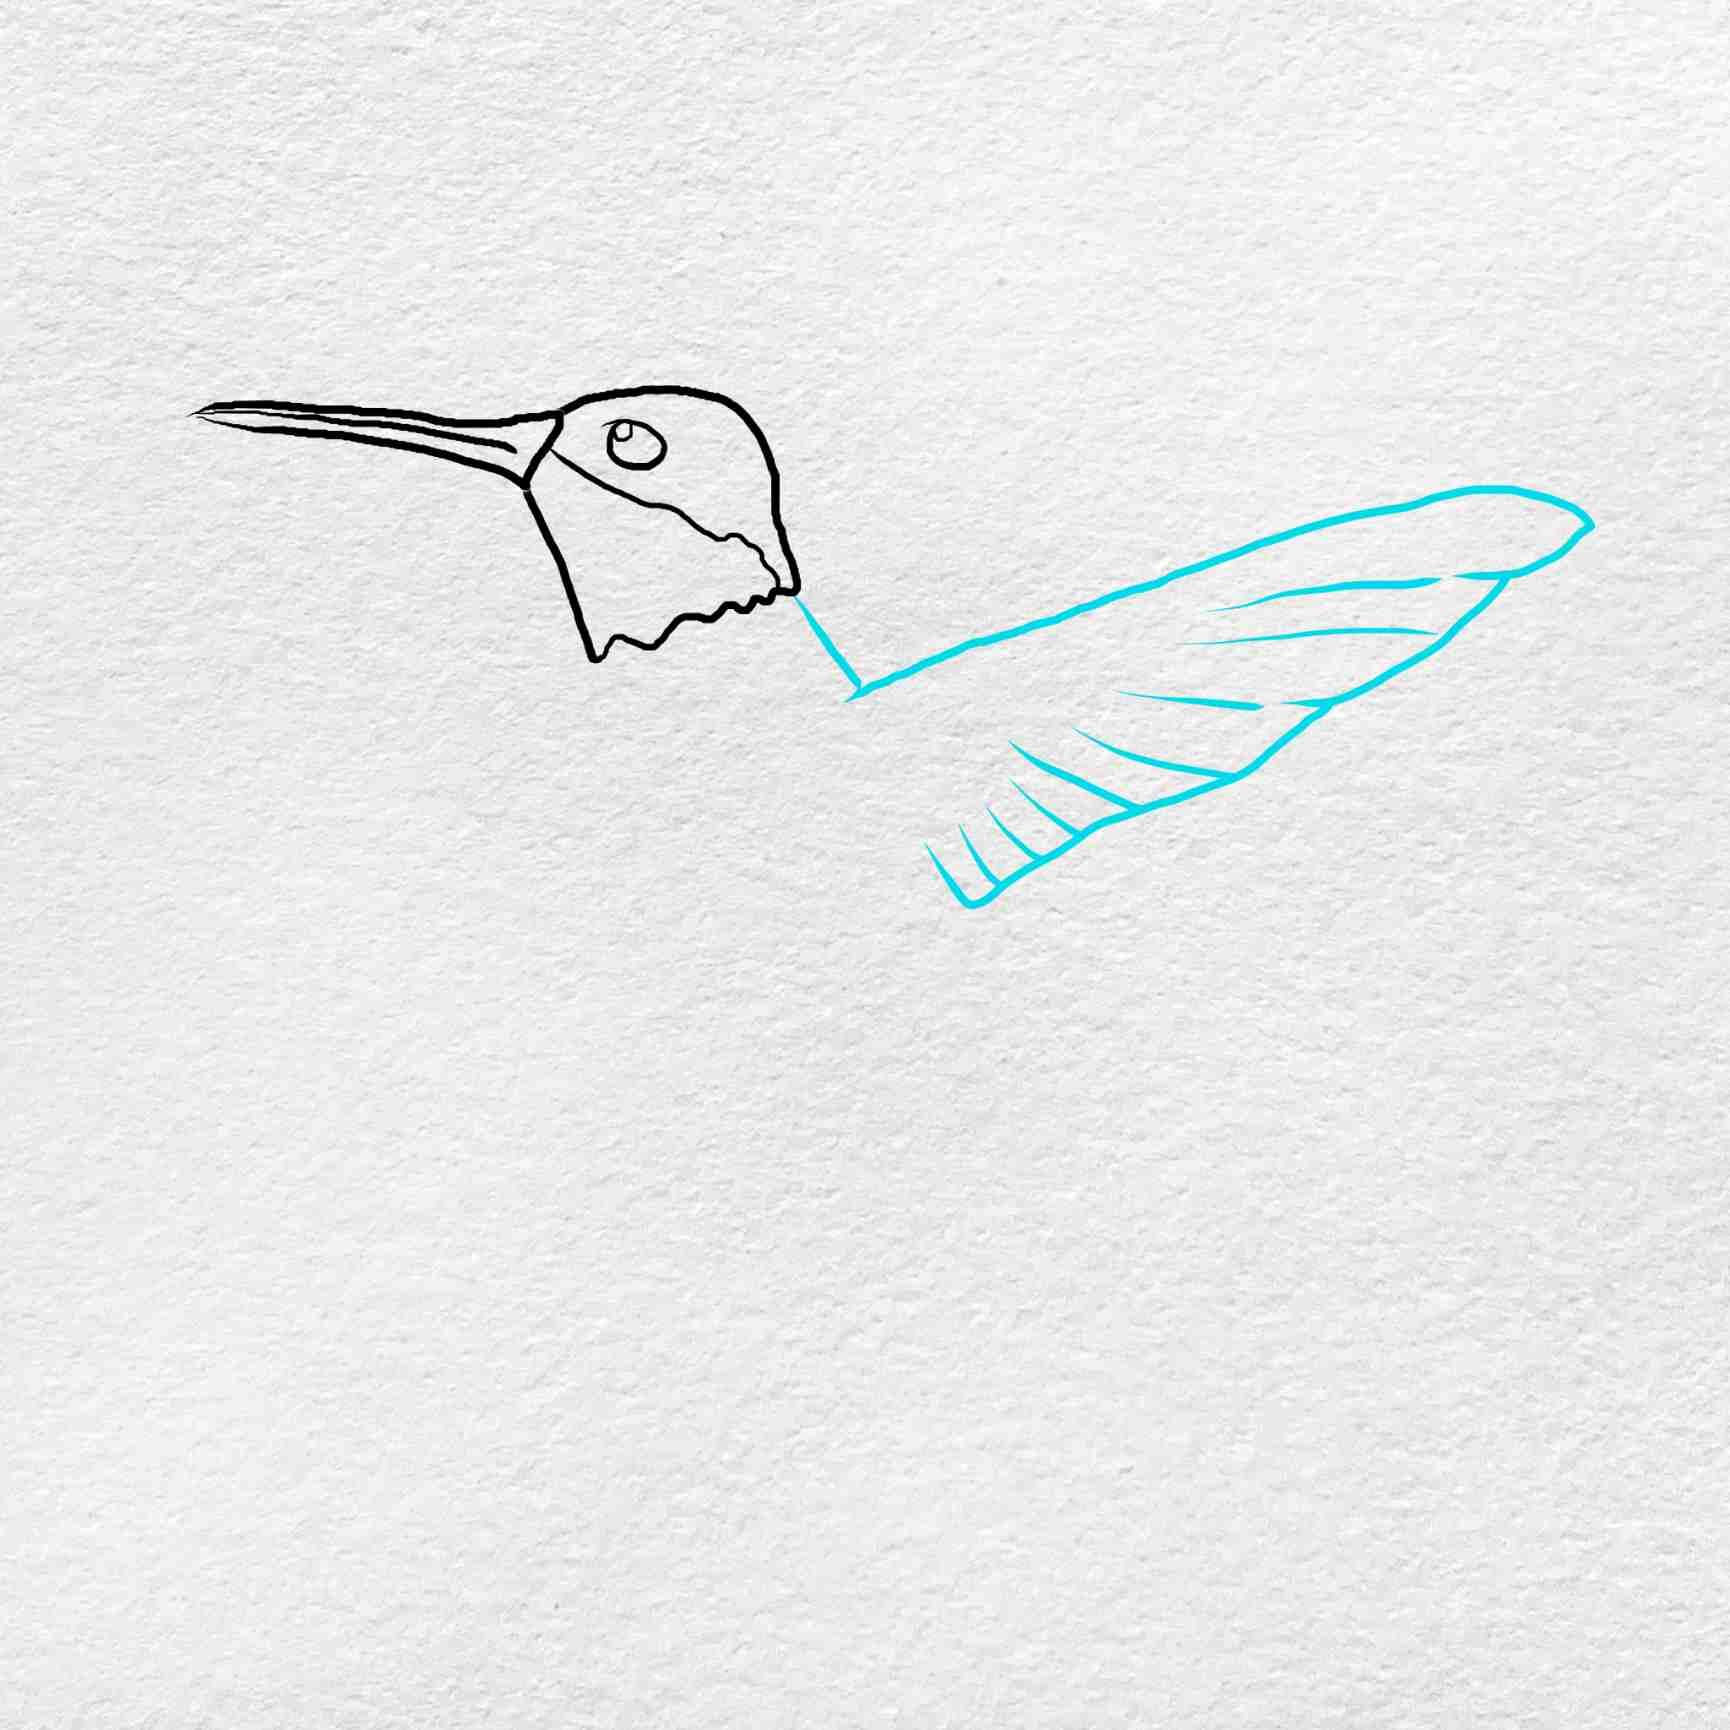 How To Draw Hummingbird: Step 3